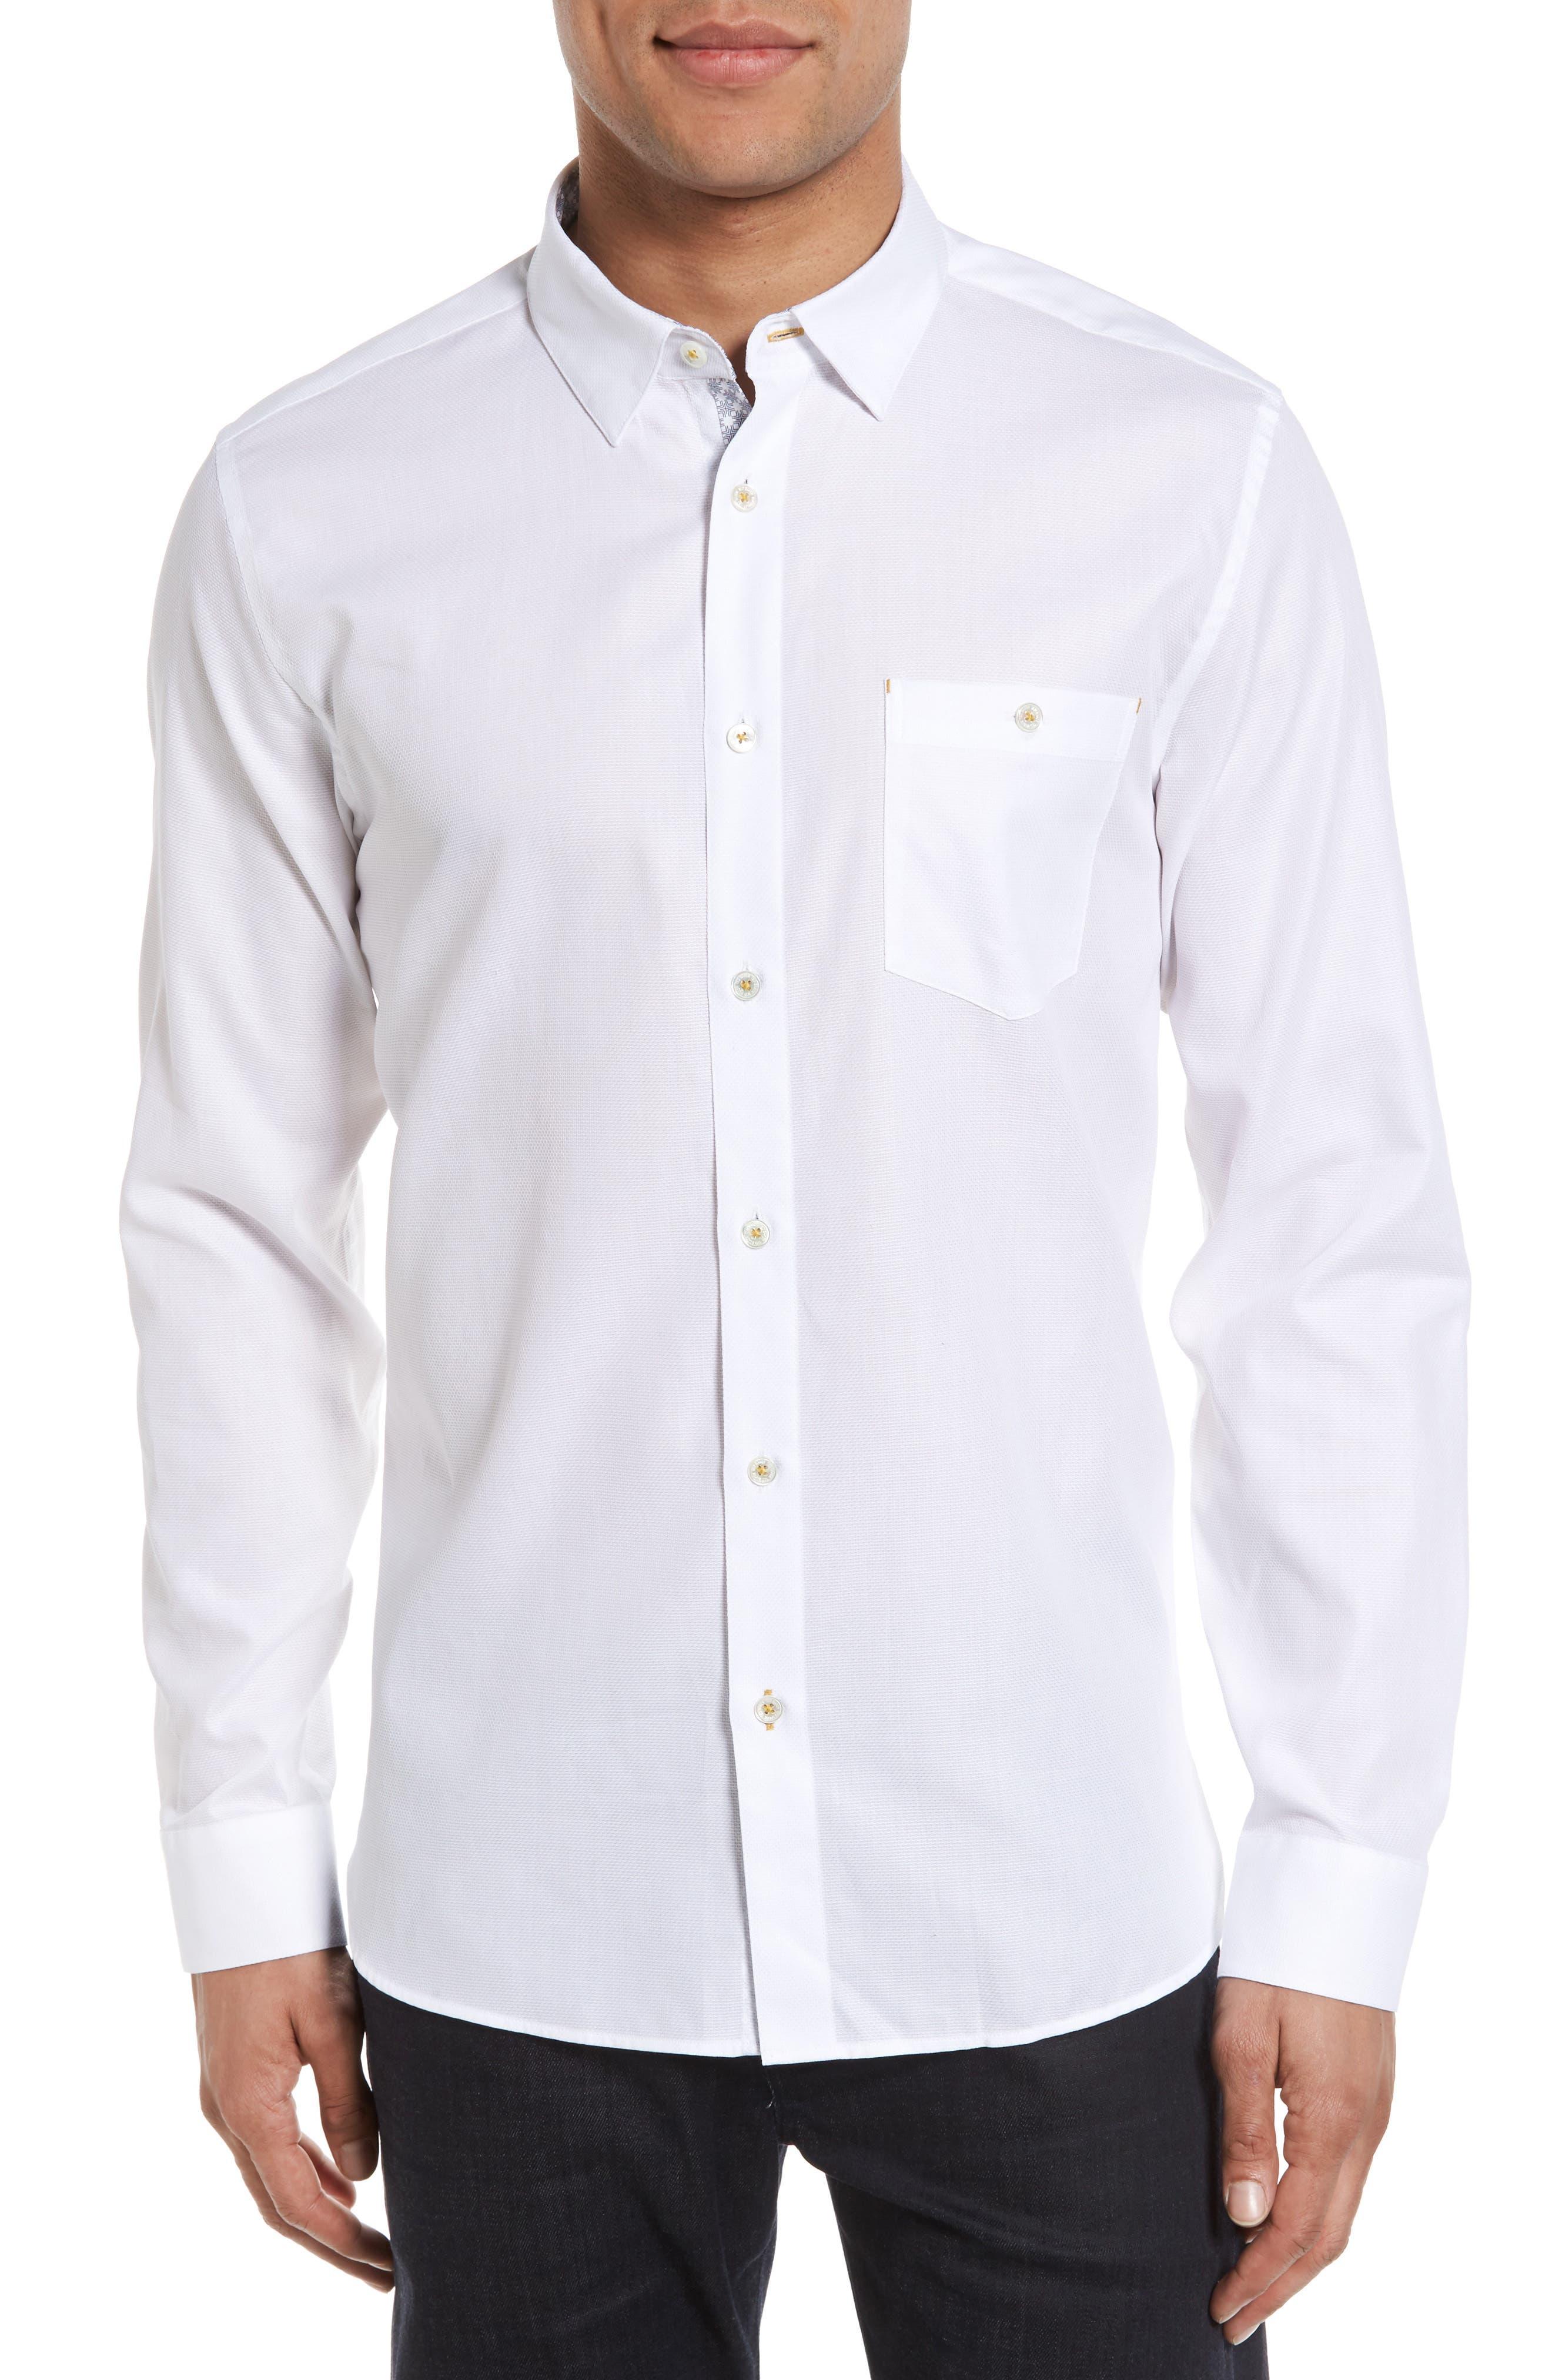 TED BAKER LONDON Nordlux Modern Slim Fit Stretch Cotton Sport Shirt